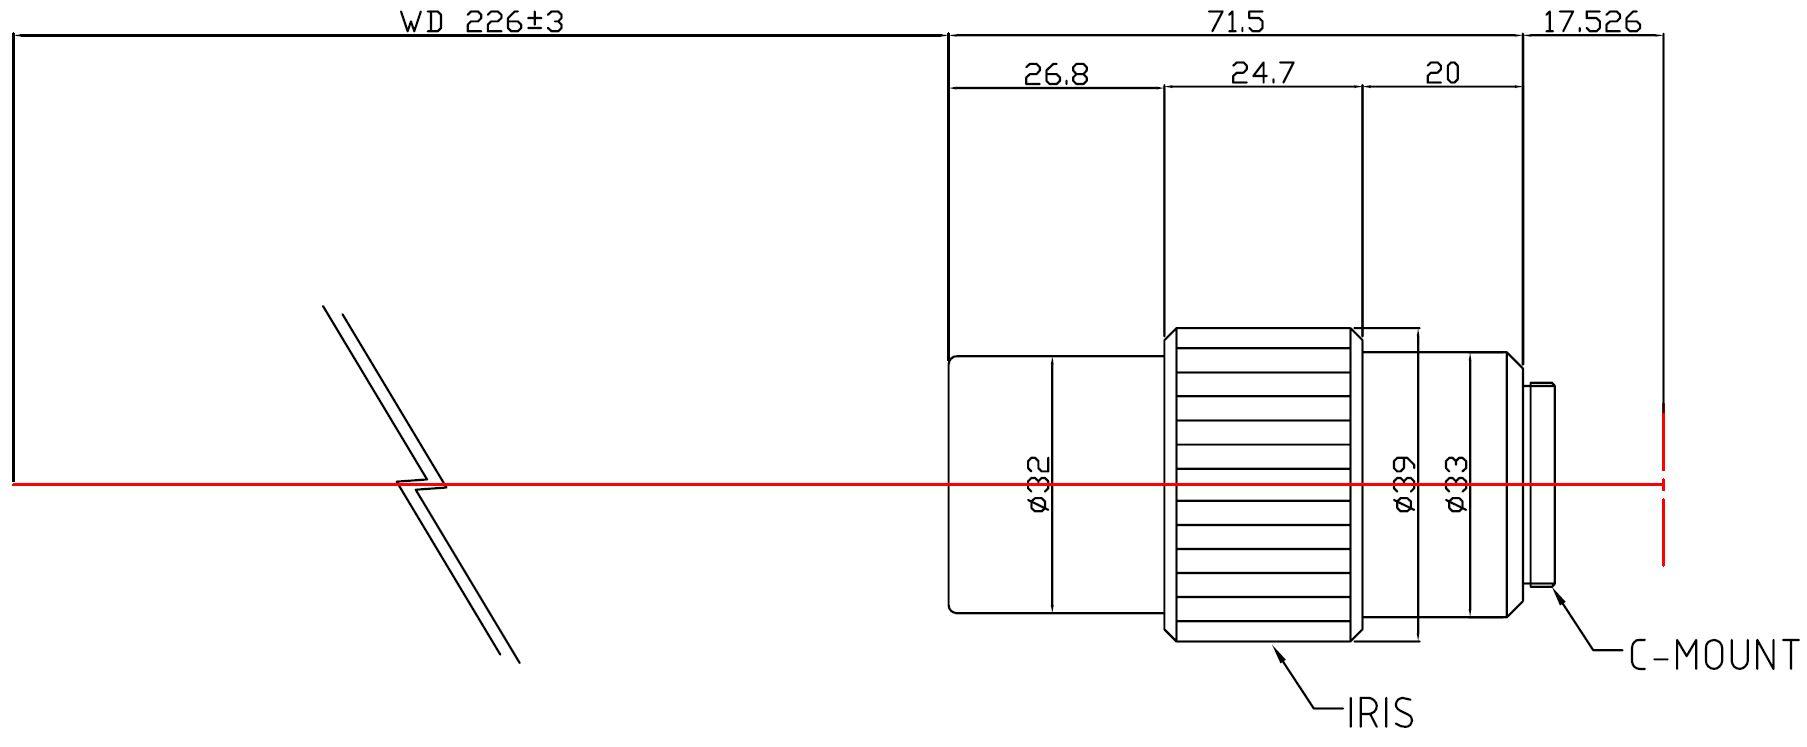 Lensagon MC4M-0215-226I